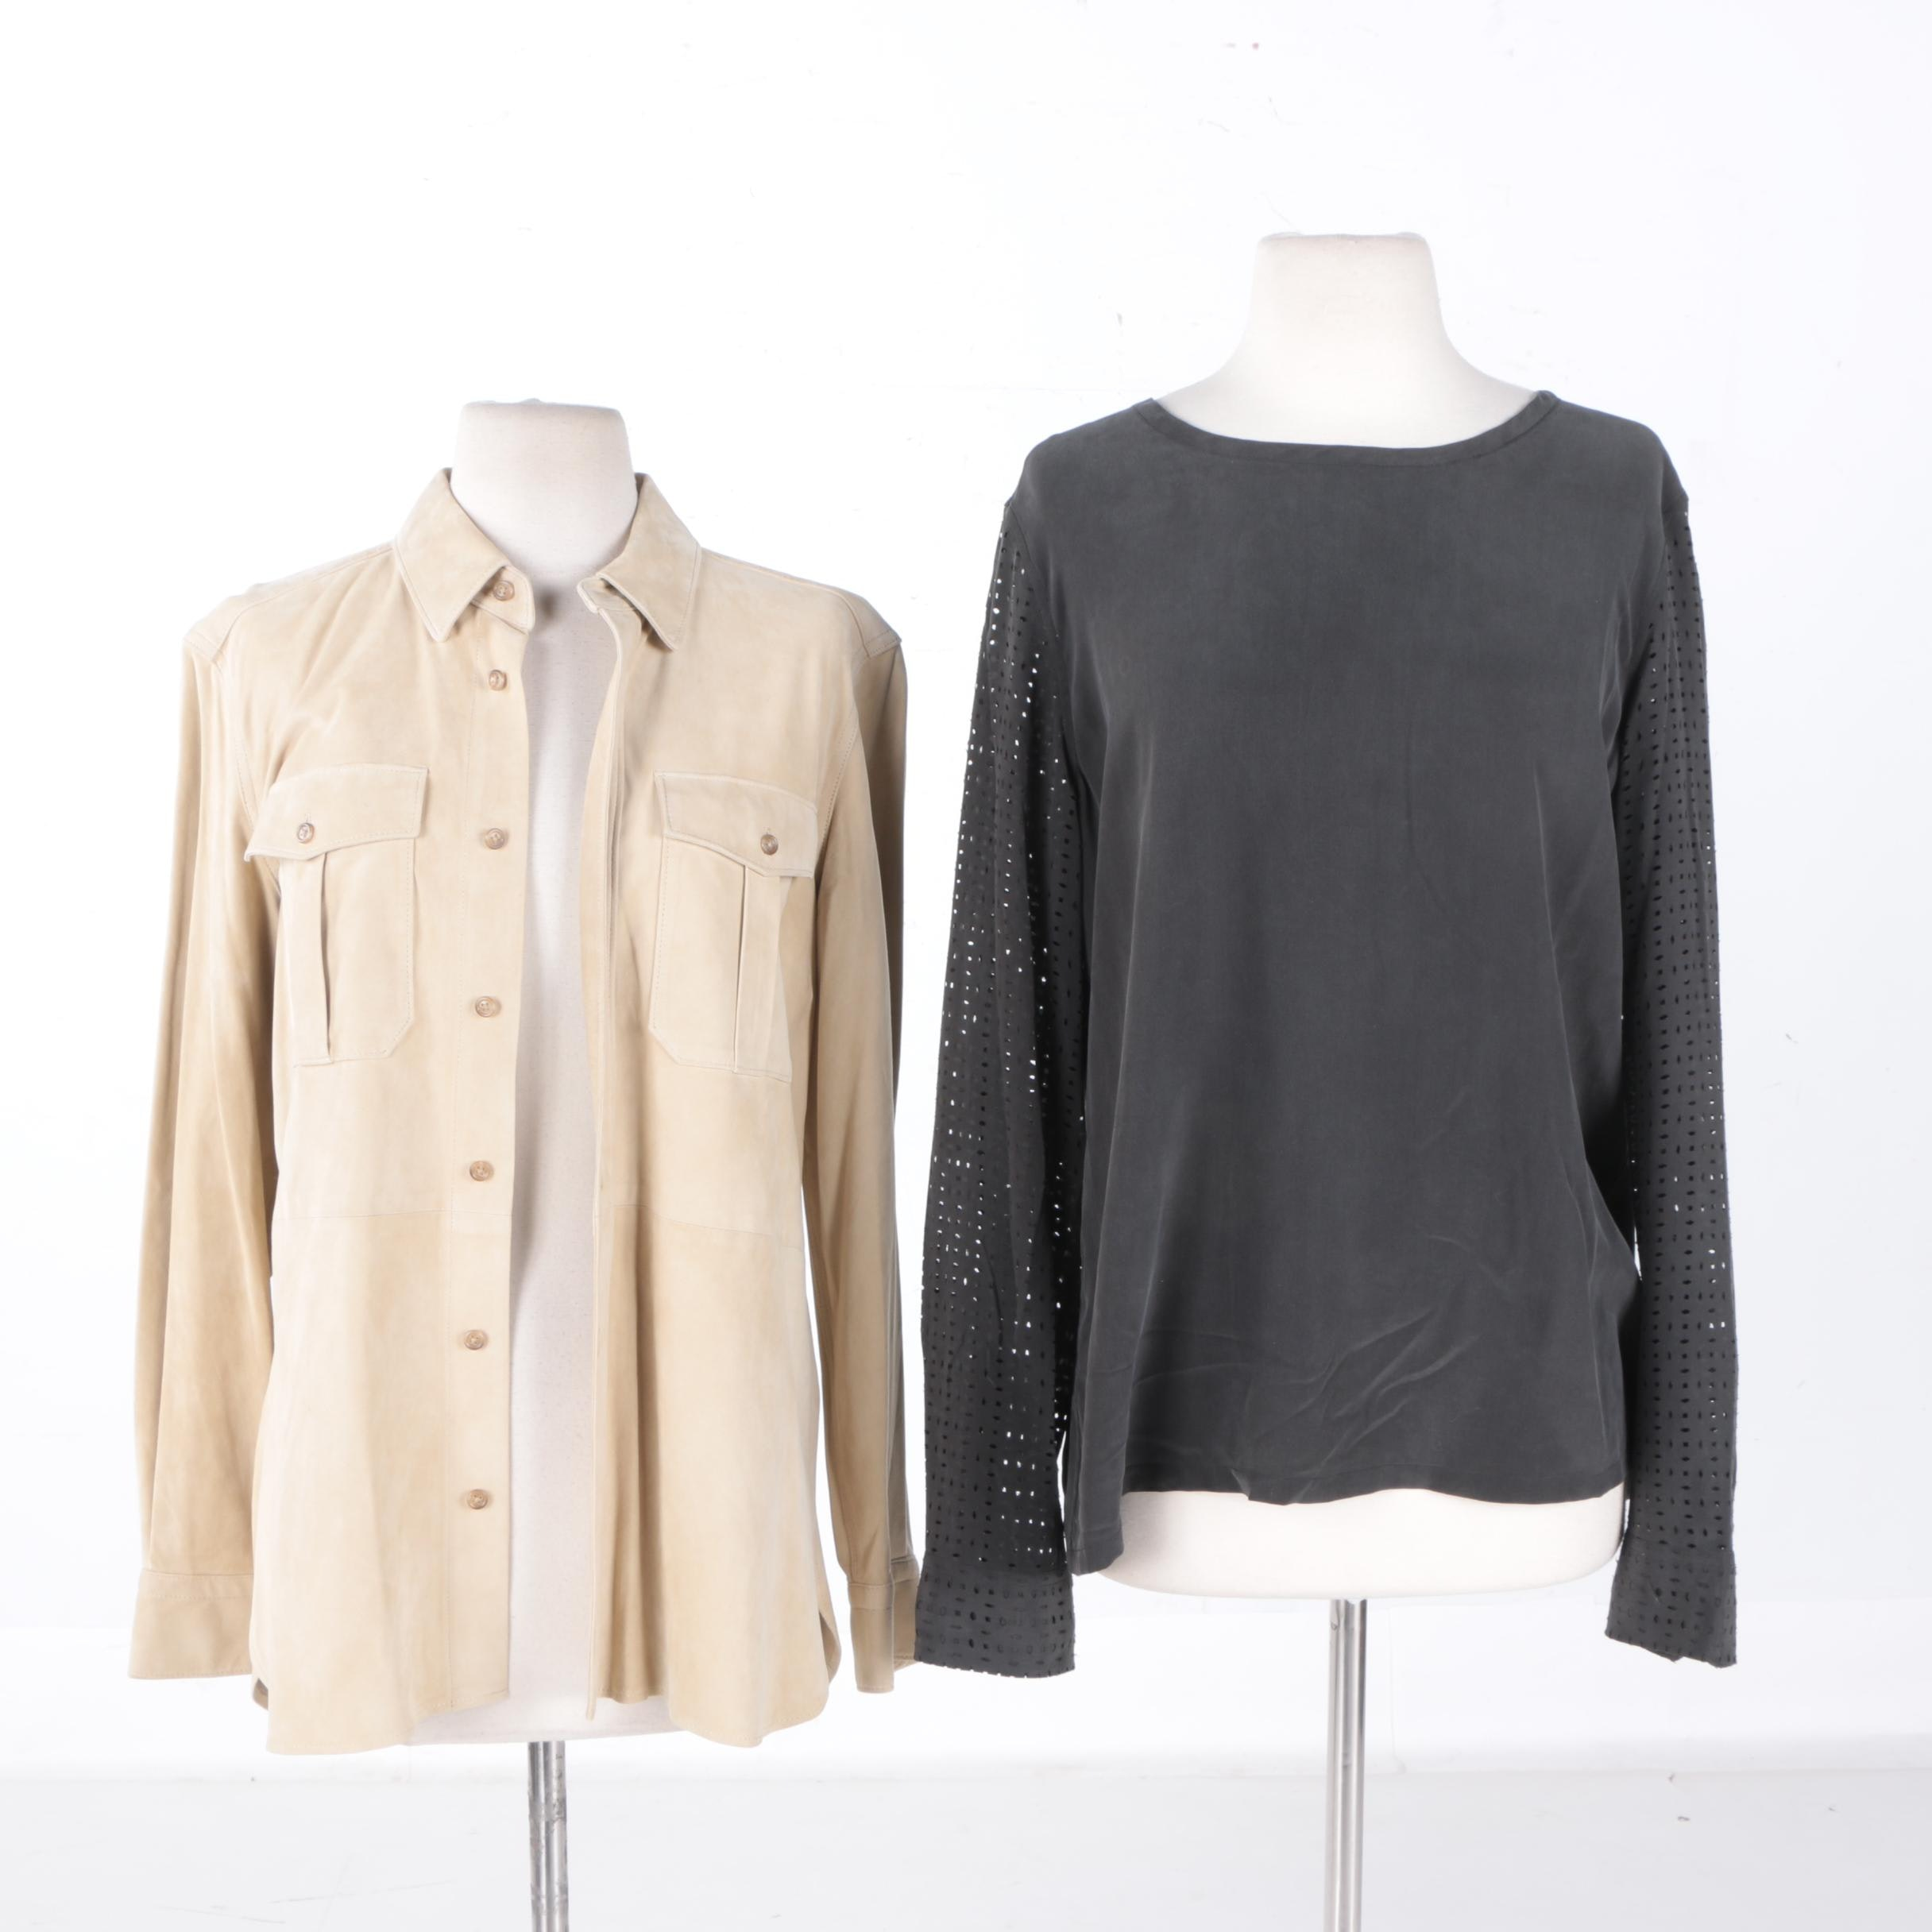 Two Women's Shirts Including Ralph Lauren